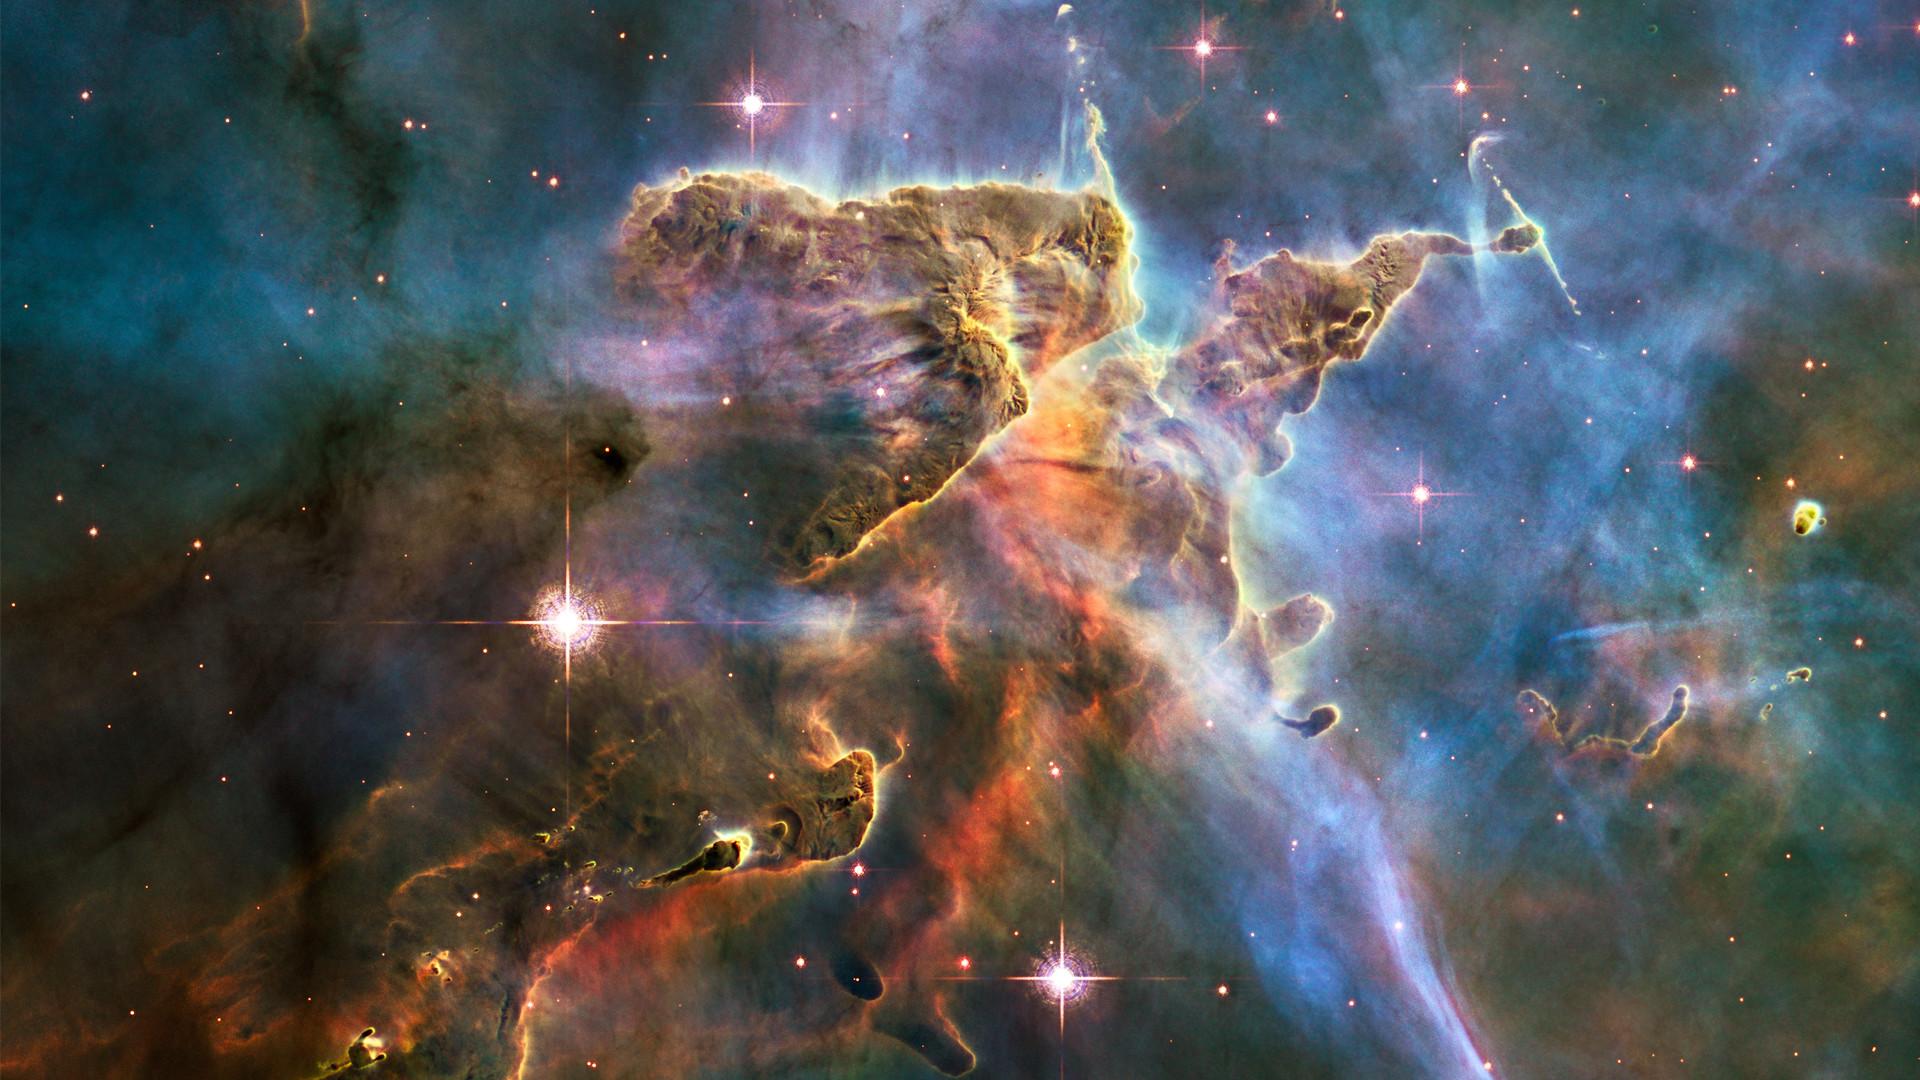 Res: 1920x1080, Desktop Nebula HD Wallpapers Free Download.